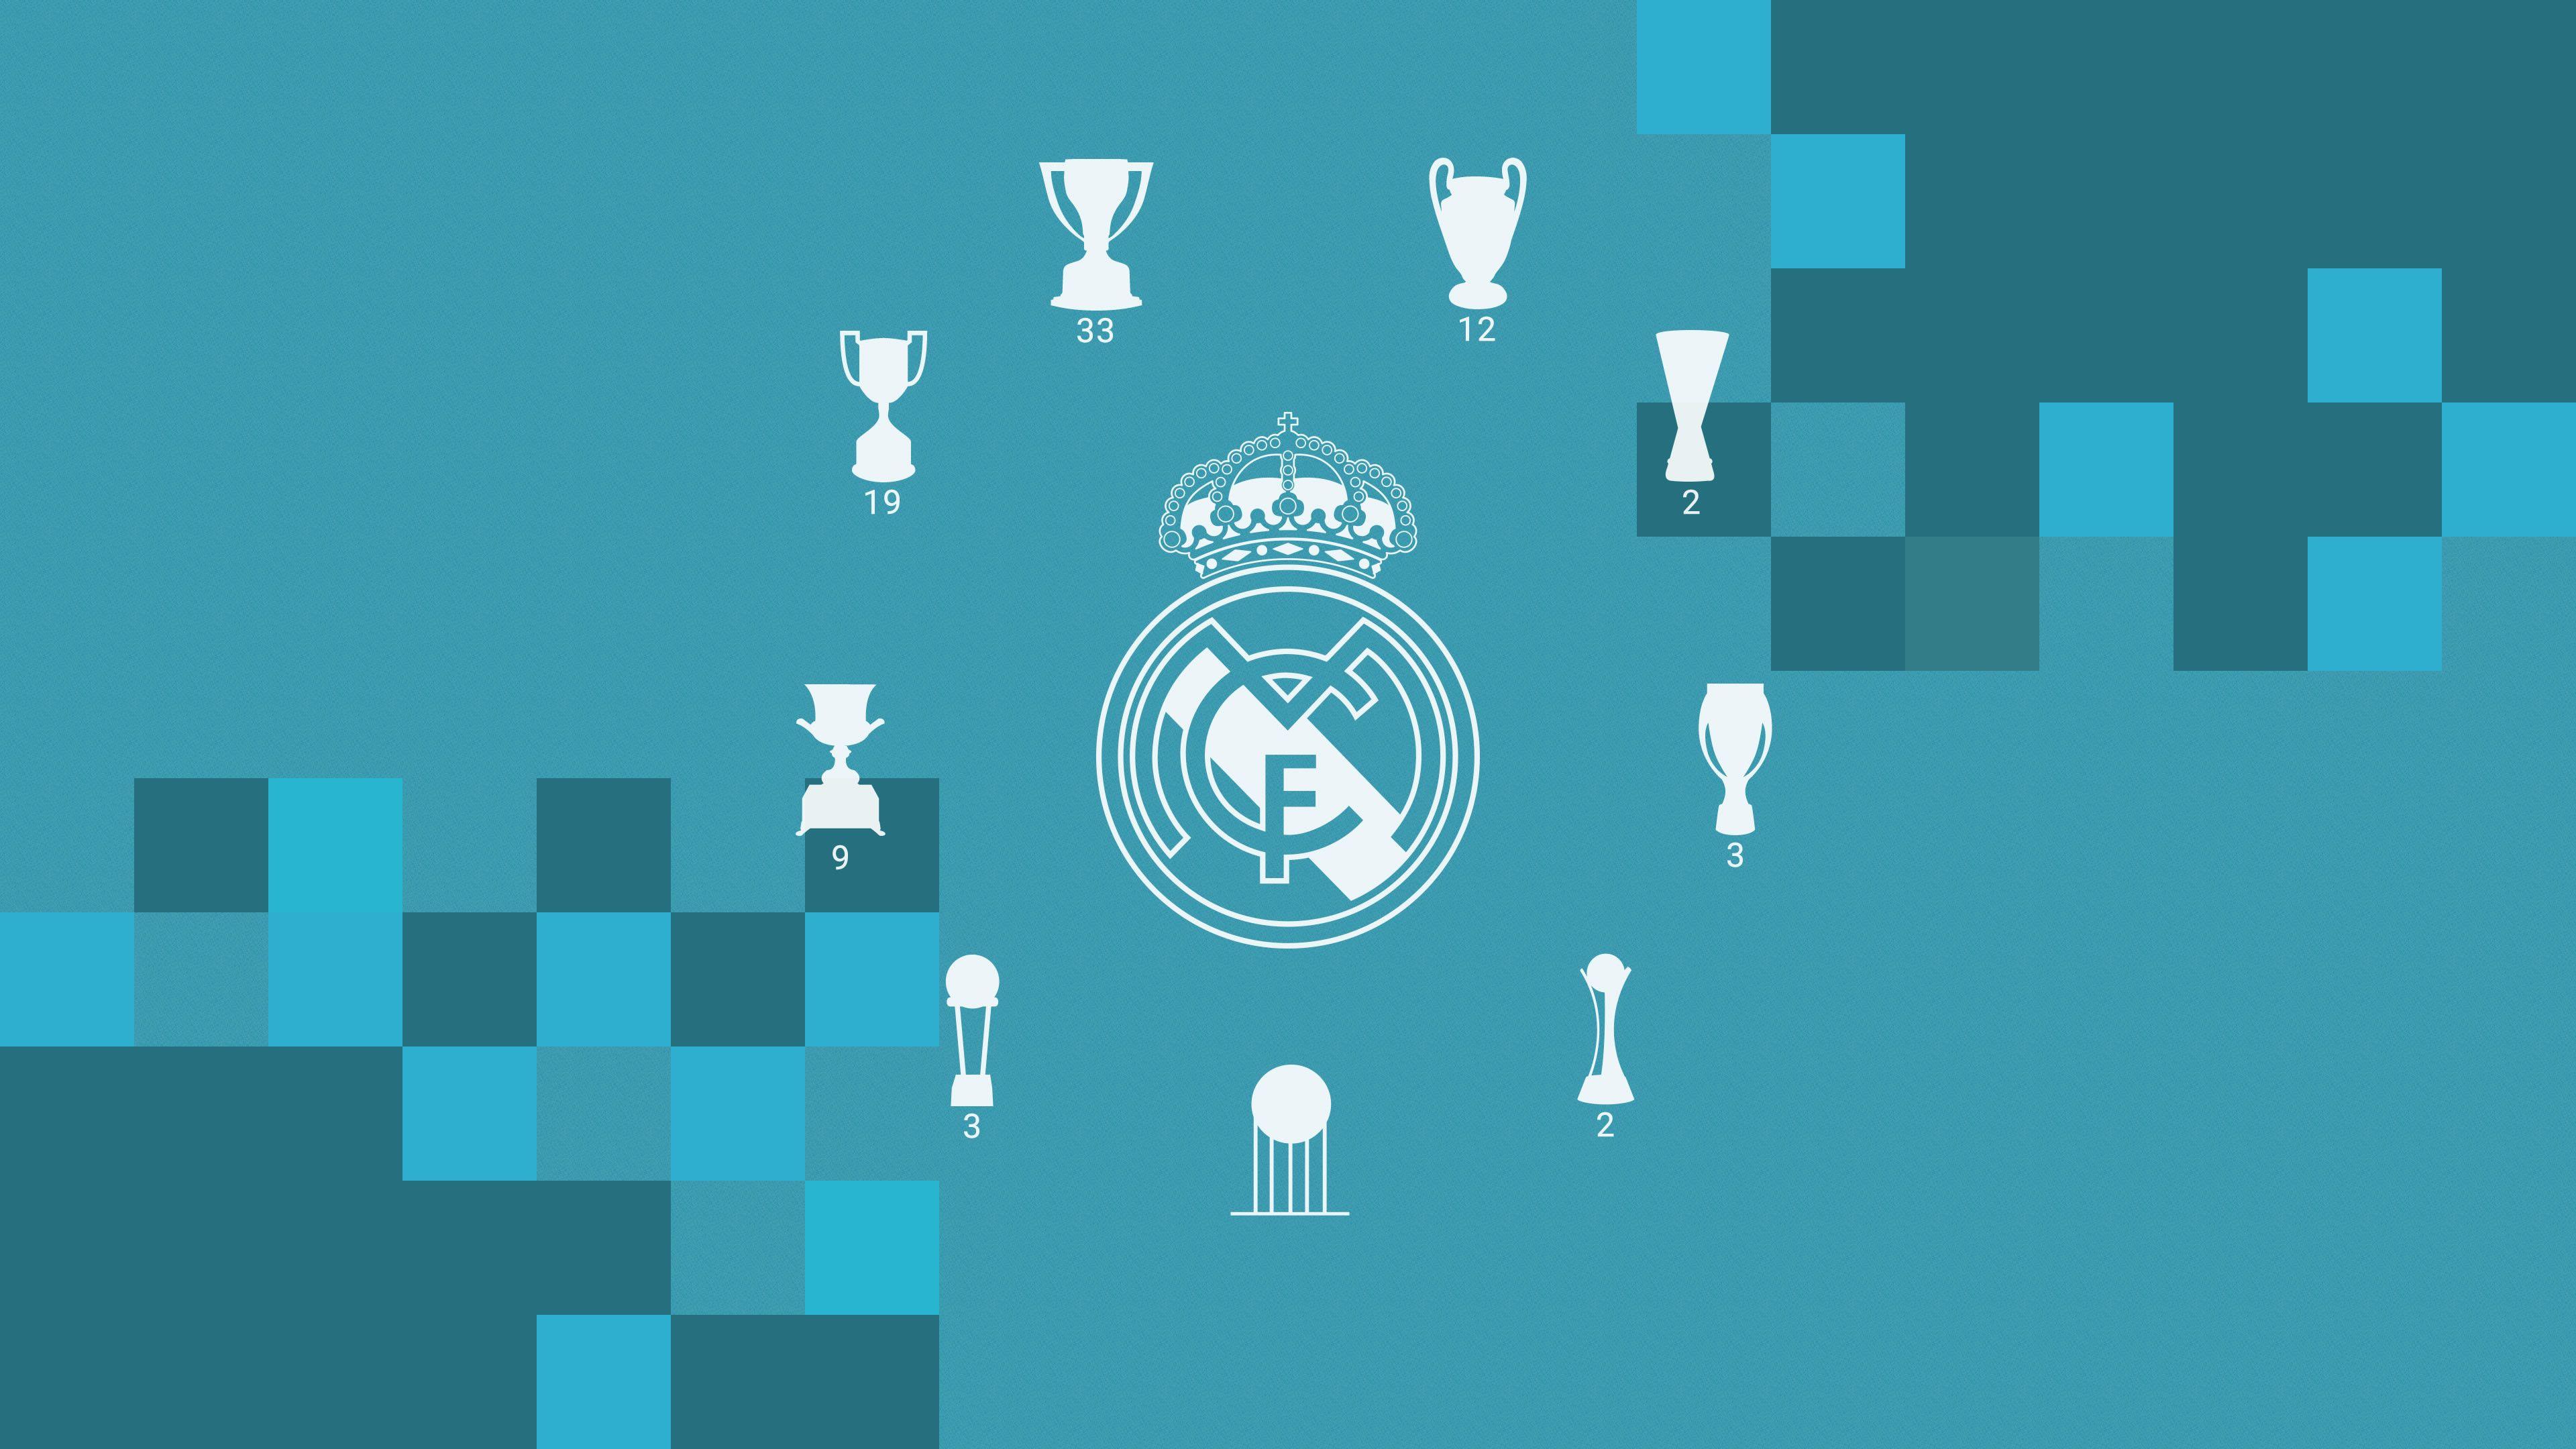 Lock Screen Real Madrid Wallpaper Iphone Hd Football In 2020 Real Madrid Wallpapers Real Madrid Logo Wallpapers Real Madrid